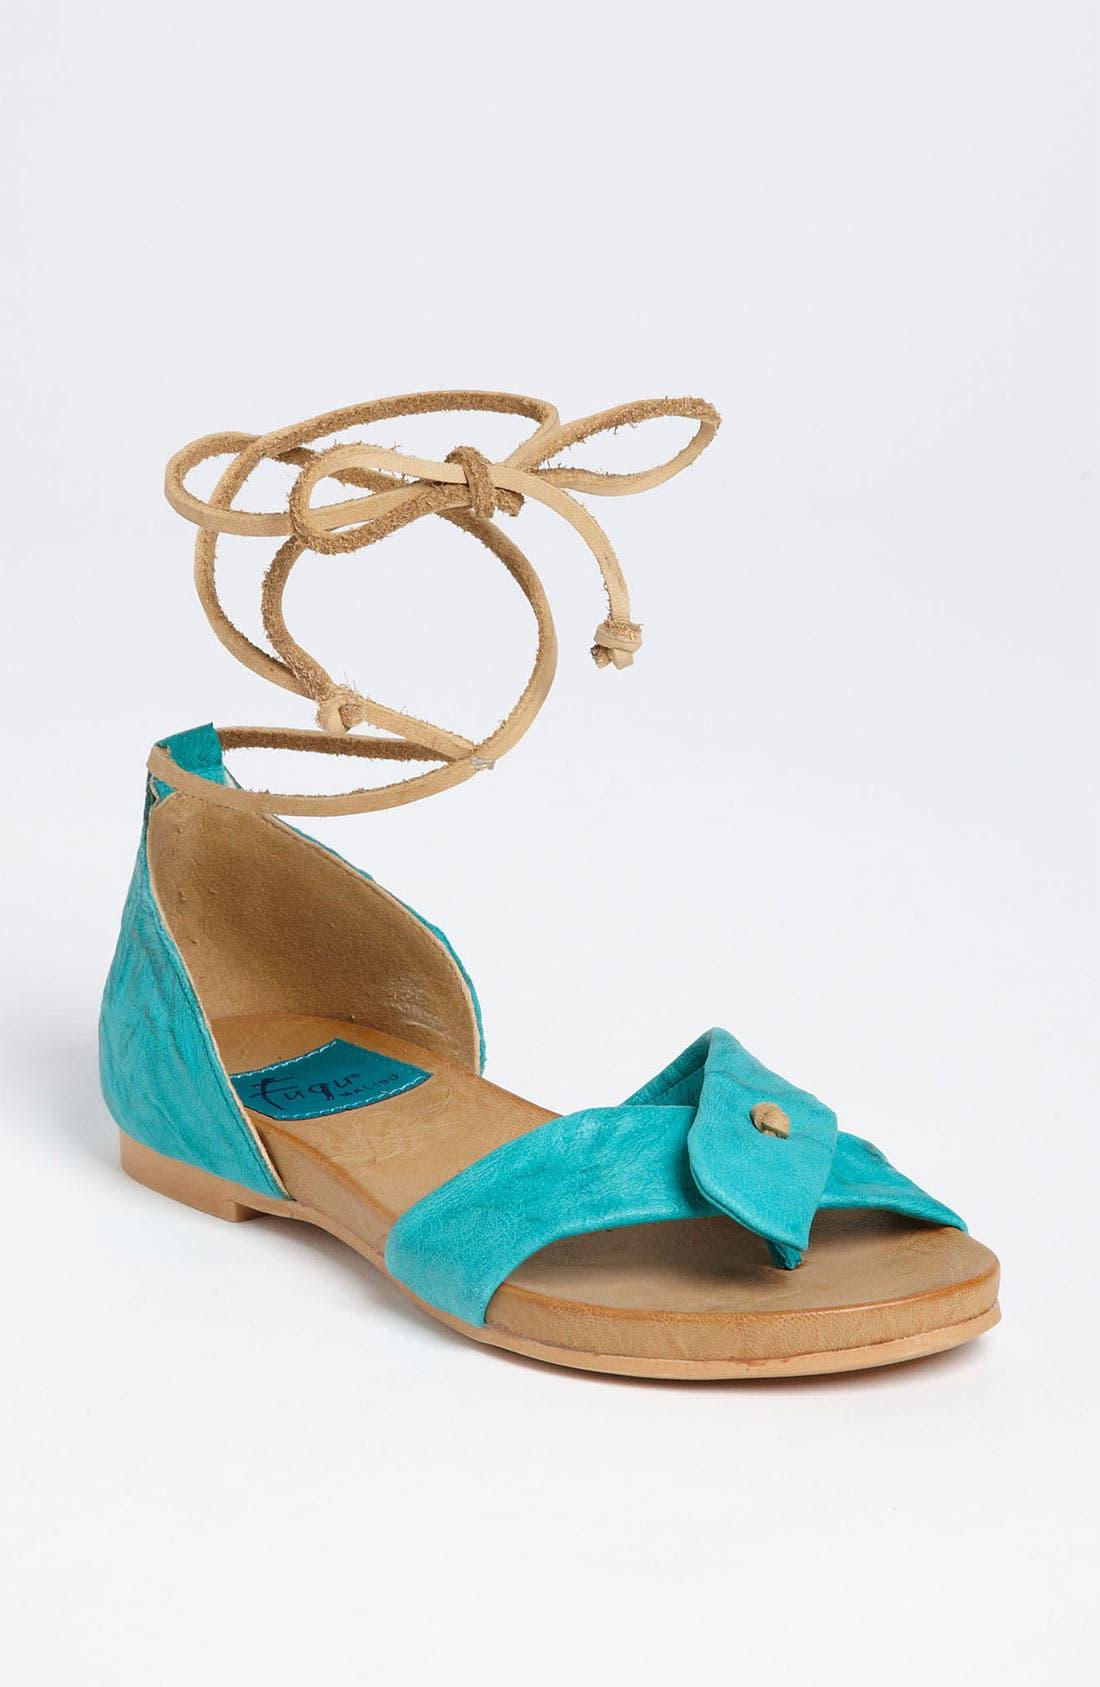 Main Image - Fugu Malibu 'Tokay' Sandal